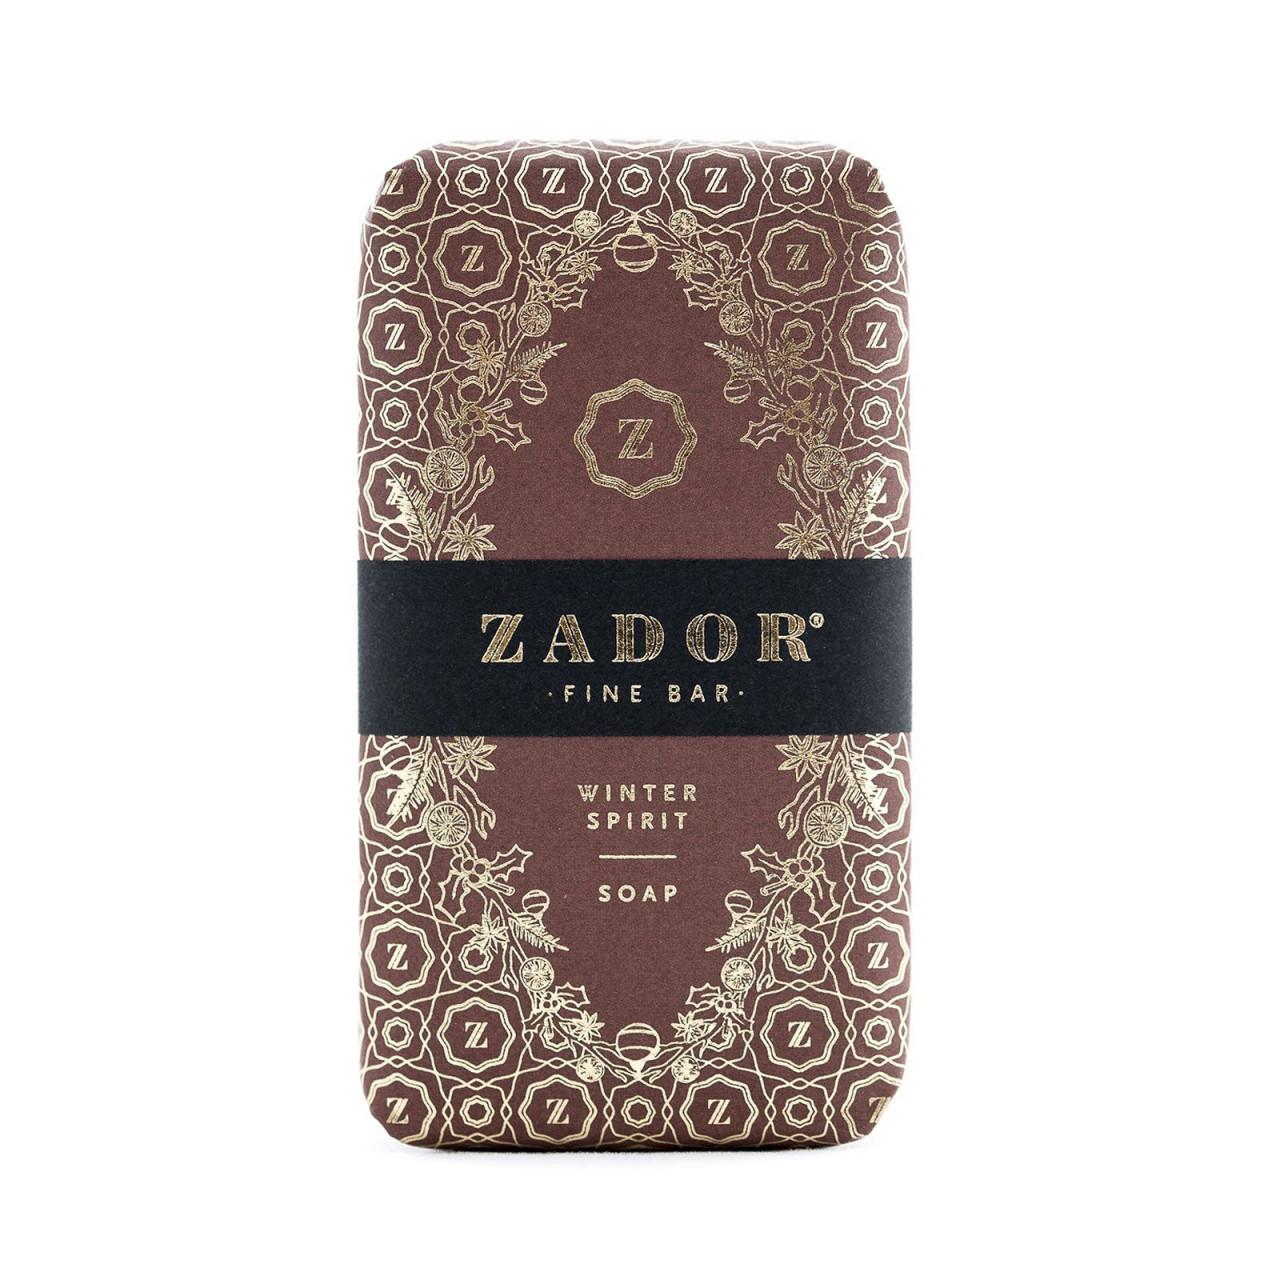 Zador Winter Spirit Soap